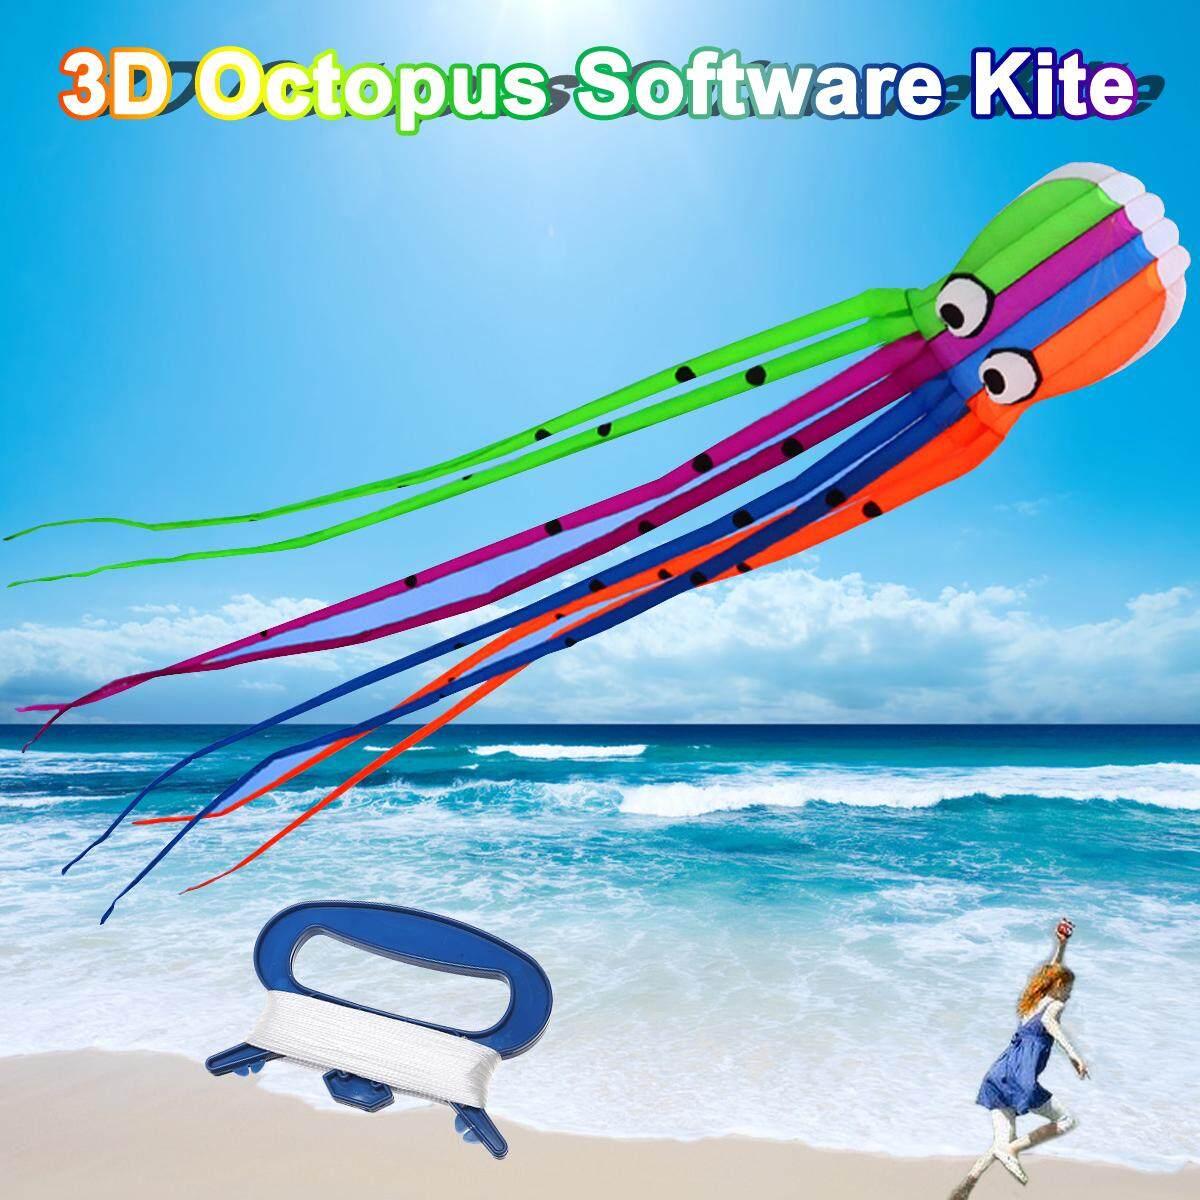 3d Octopus Kite 3d Cartoon Software Kite Outdoor 3d Coourful Kite By Freebang.